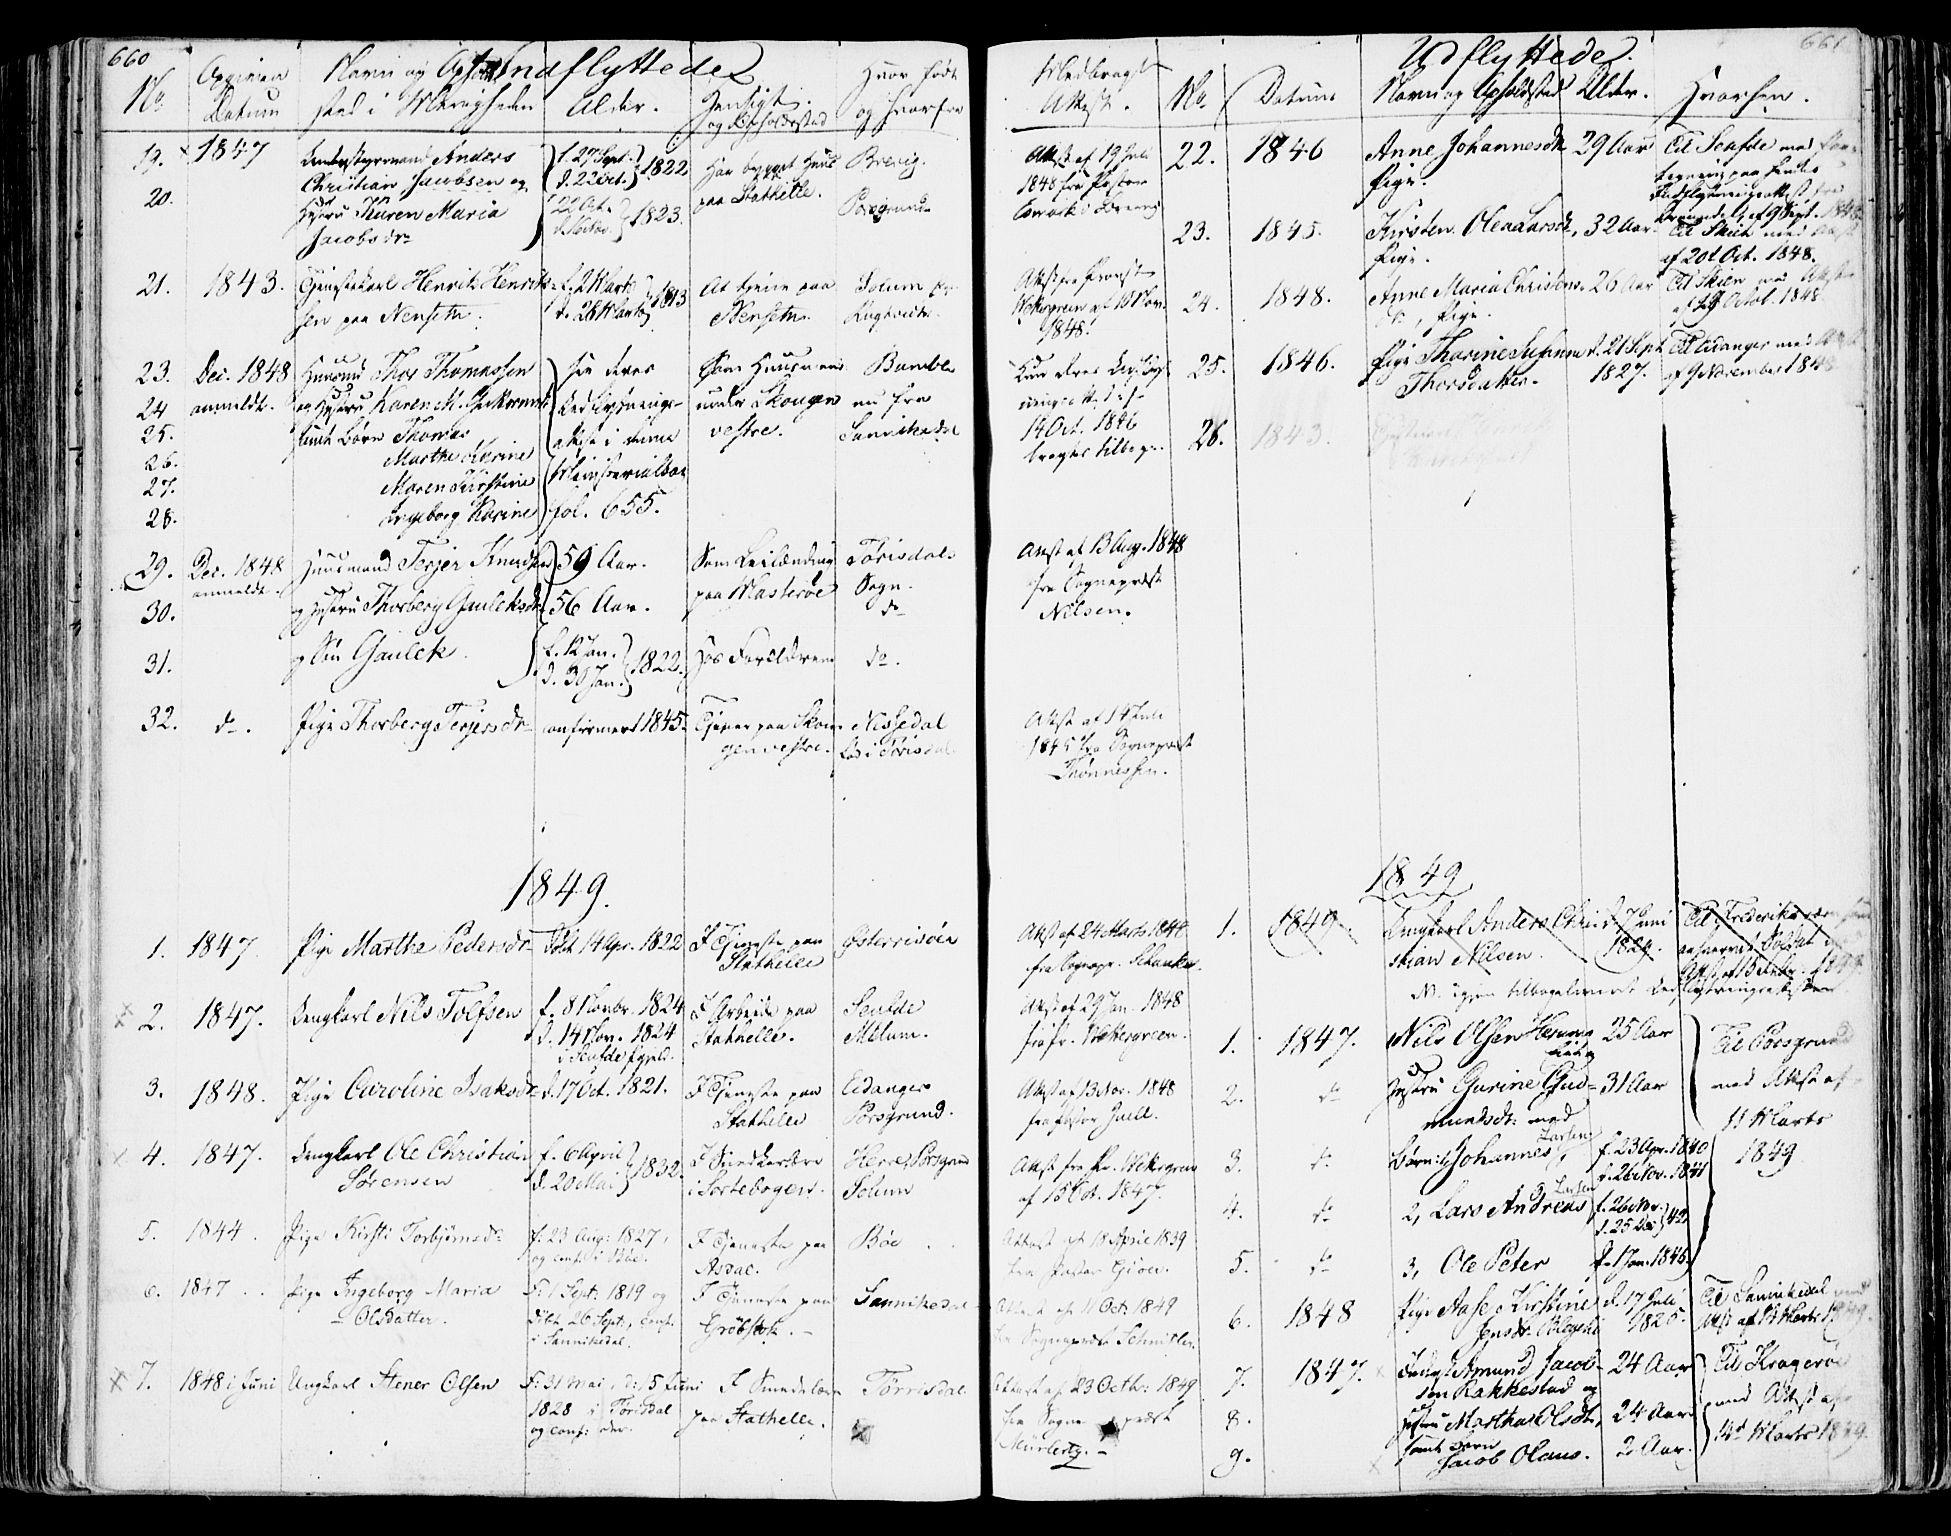 SAKO, Bamble kirkebøker, F/Fa/L0004: Ministerialbok nr. I 4, 1834-1853, s. 660-661